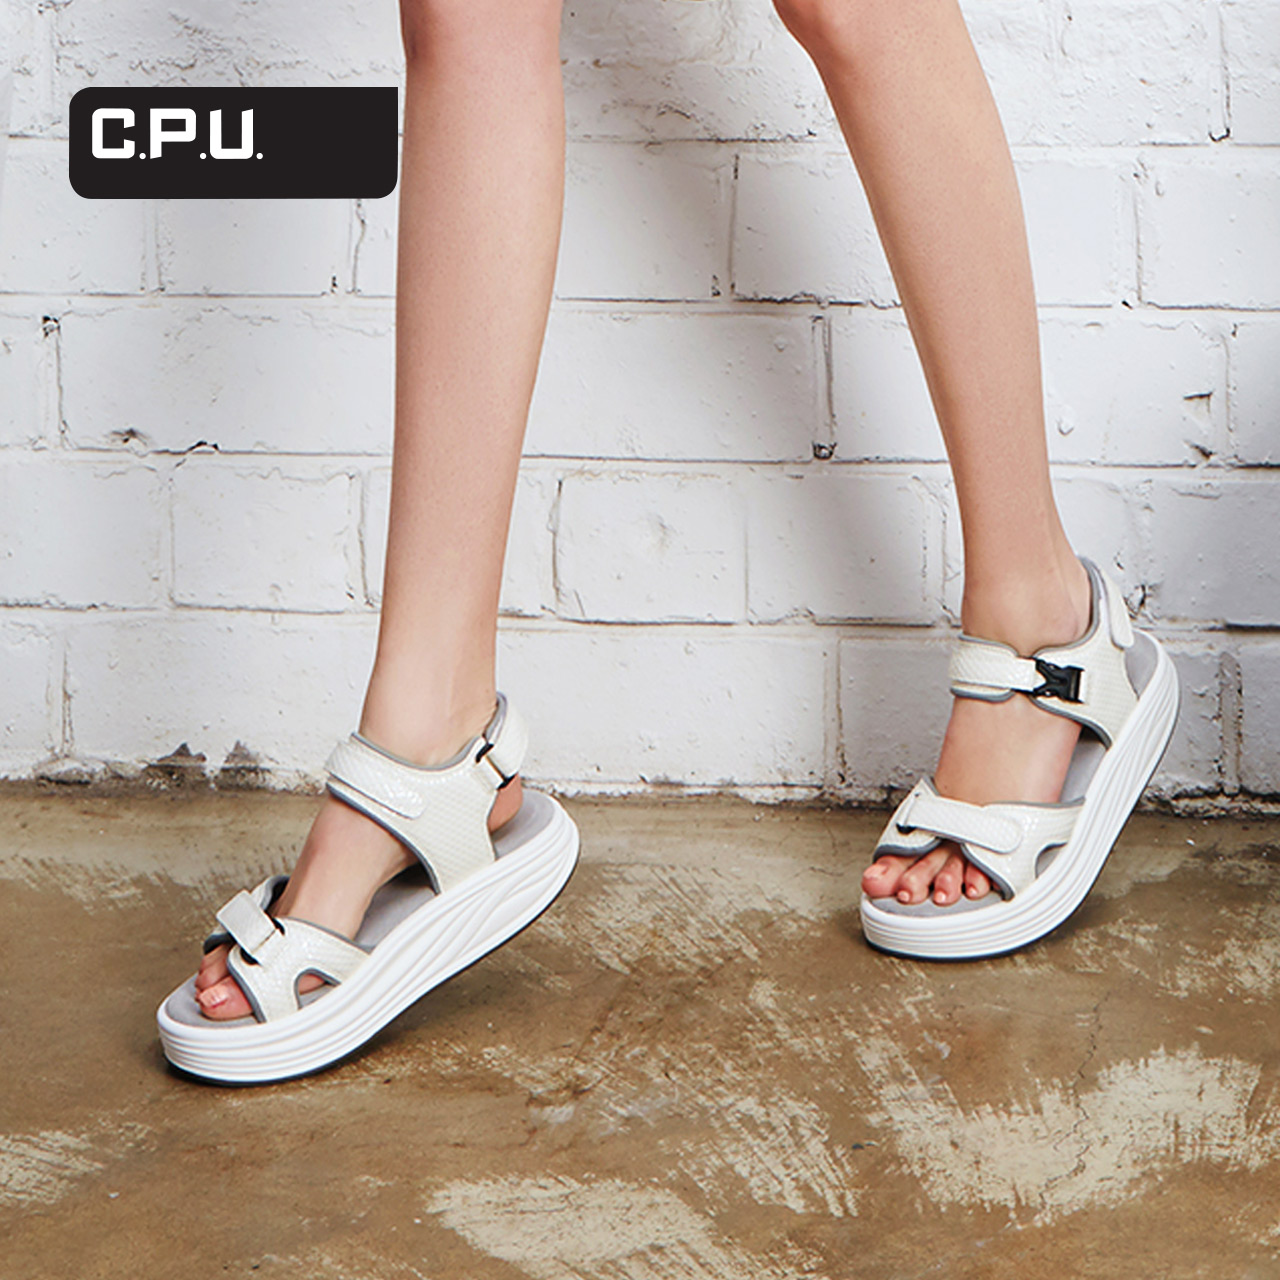 C.P.U.Rabu Rabu时尚舒适摇摇鞋夏凉鞋女压纹潮酷女款凉鞋